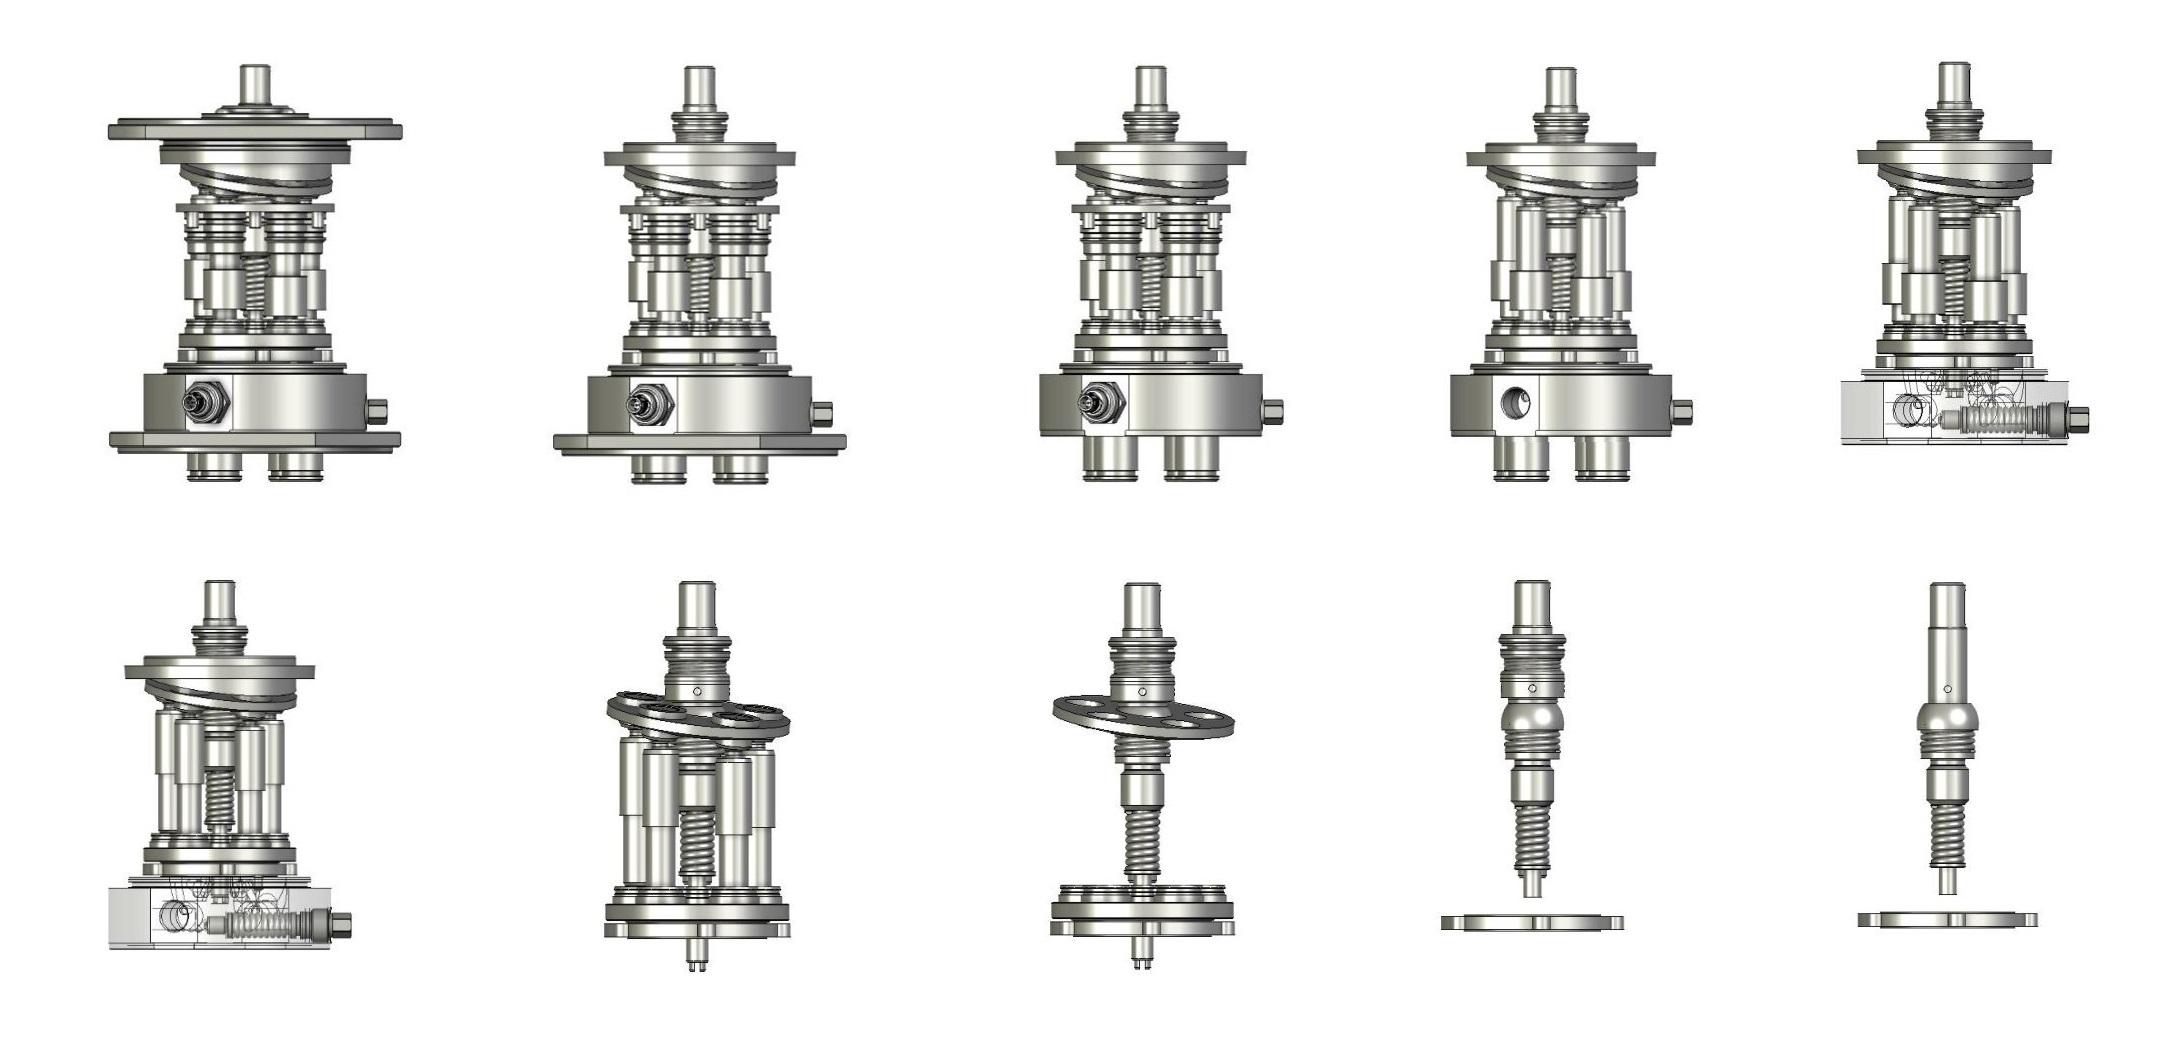 APPR pump assembling